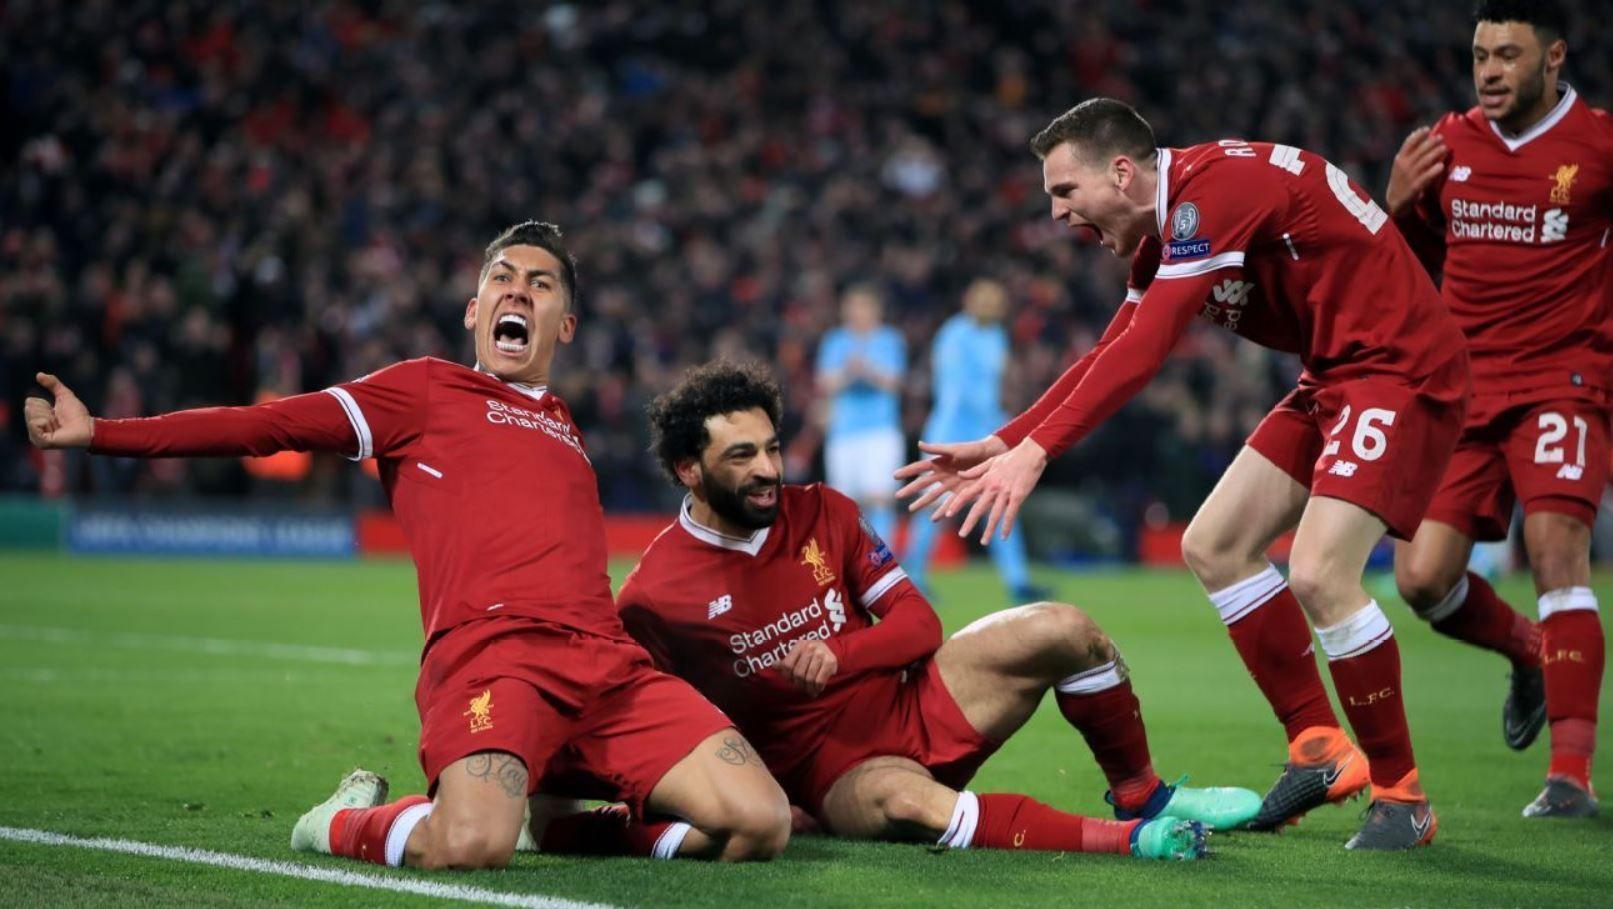 Liverpool Football Team Liverpool football team